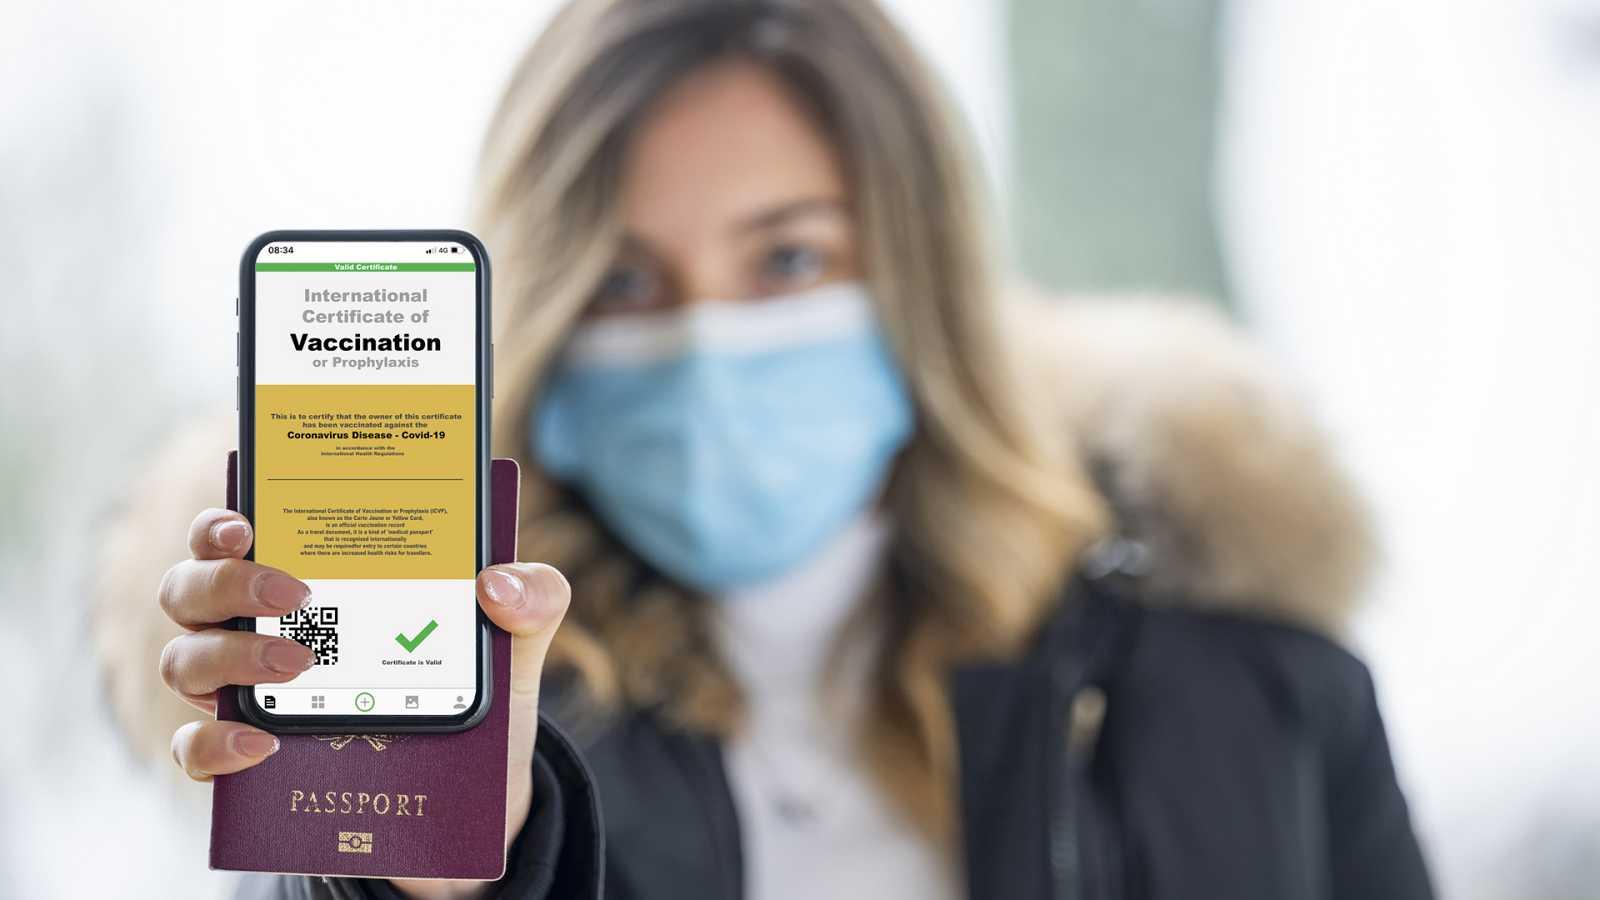 Europa abierta - La Eurocámara exige un pasaporte COVID claro, seguro e igualitario  - escuchar ahora